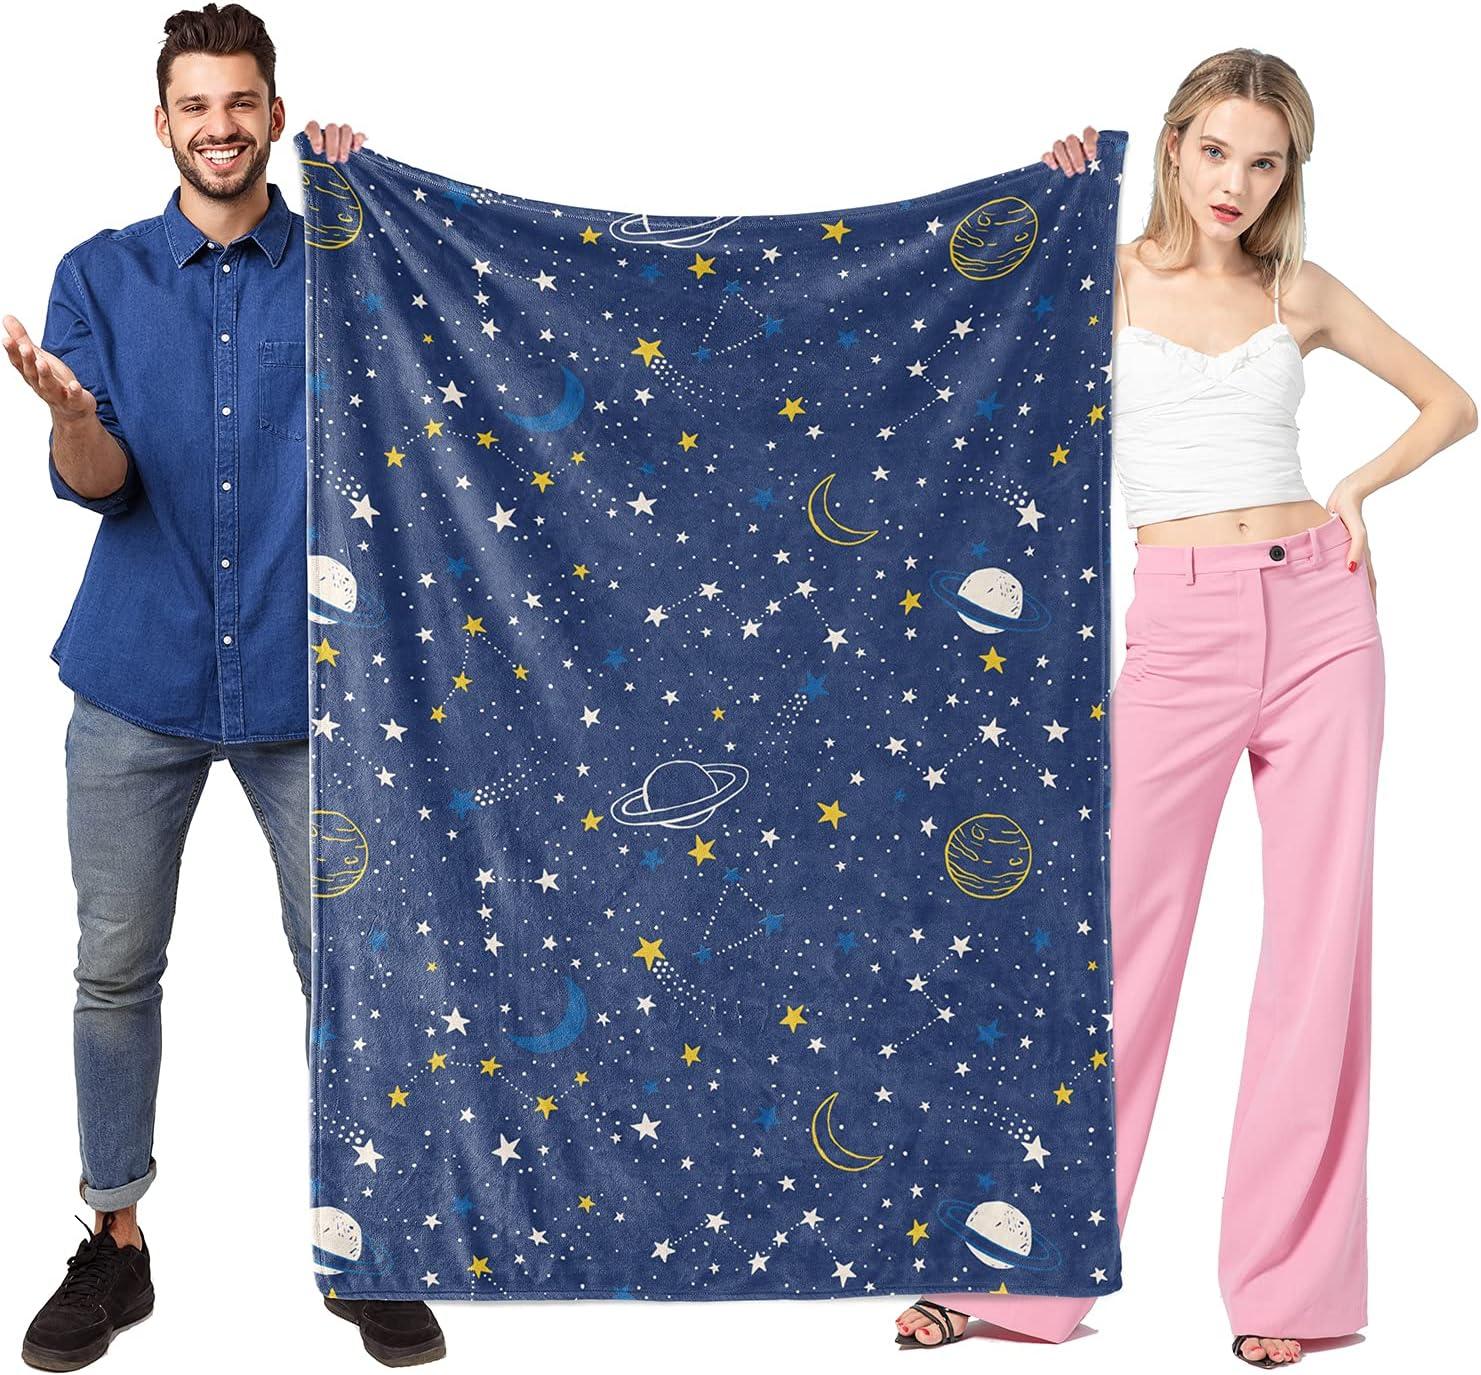 Sinpooo Galaxy Stars Pattern Flannel Thick Max Ranking TOP4 47% OFF Soft L Blanket Fleece